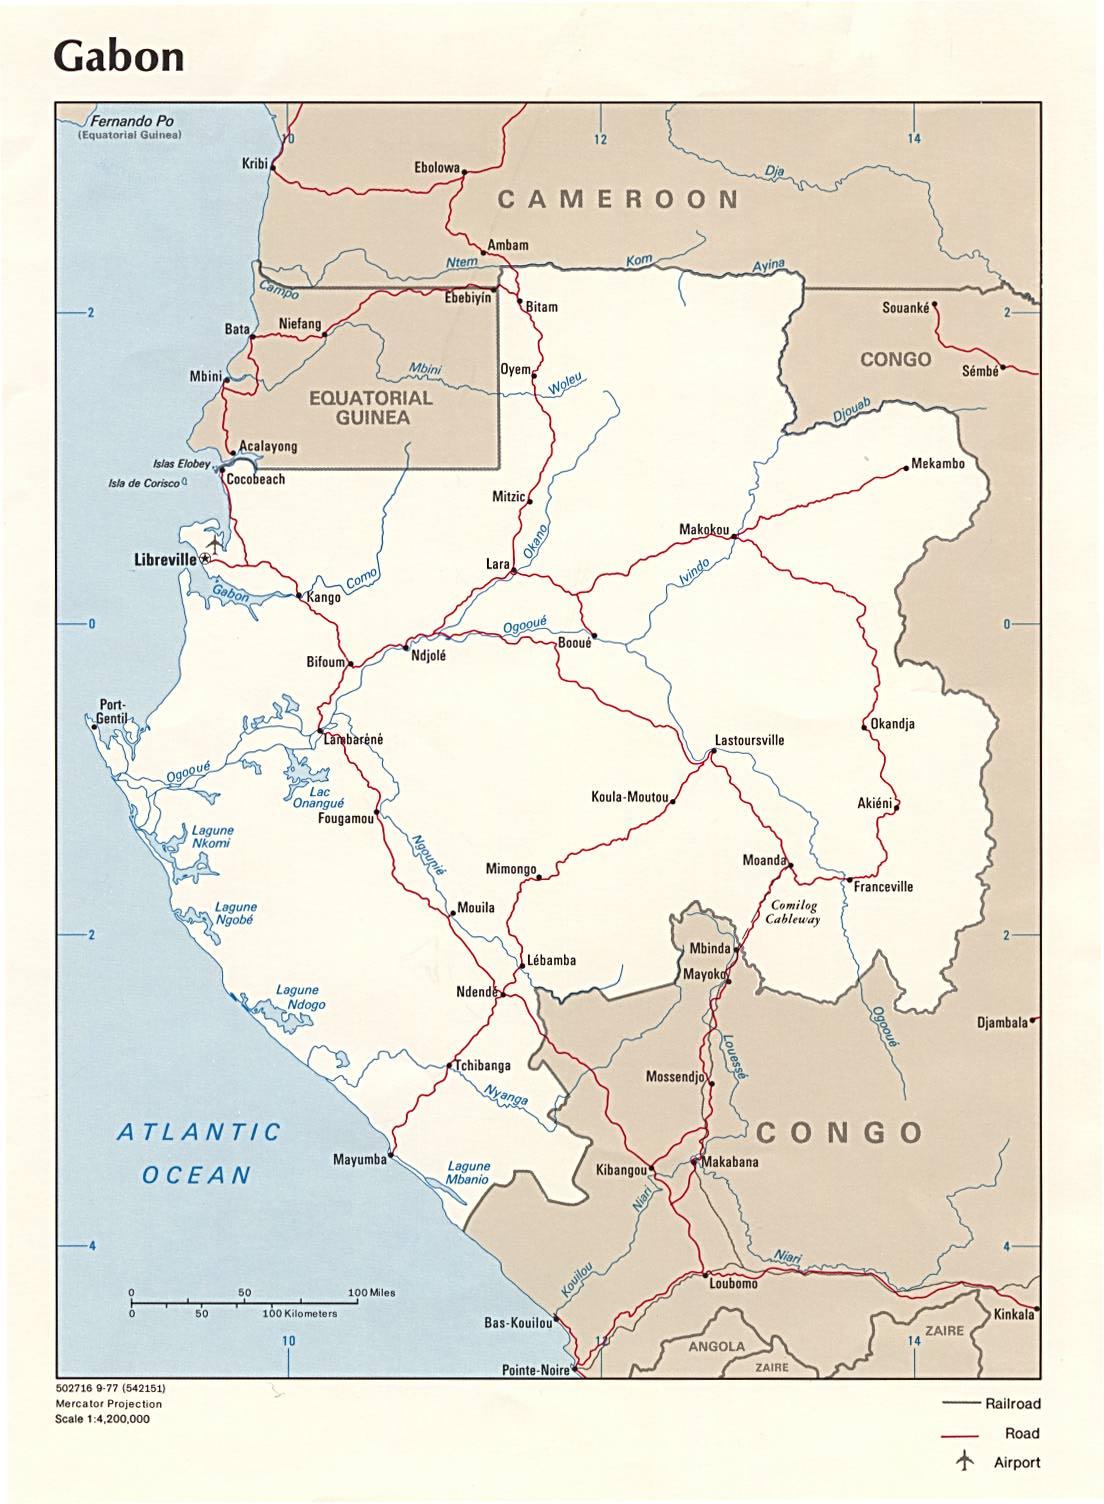 Mapa Politico de Gabón